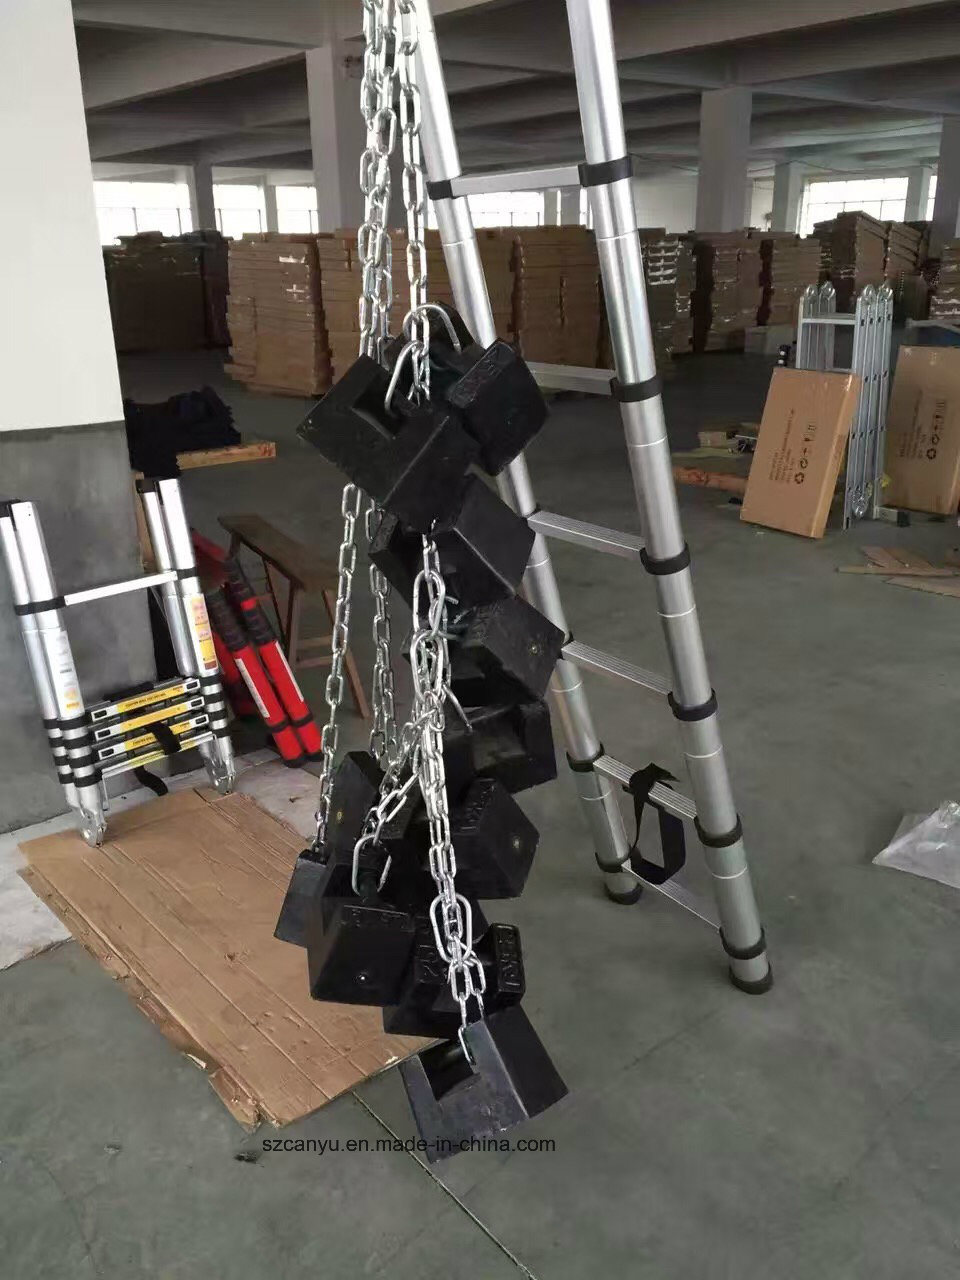 2.6m/3.2m/3.8m En131-6 Telescopic Ladder, Aluminum Step Ladder, Ladder Aluminum